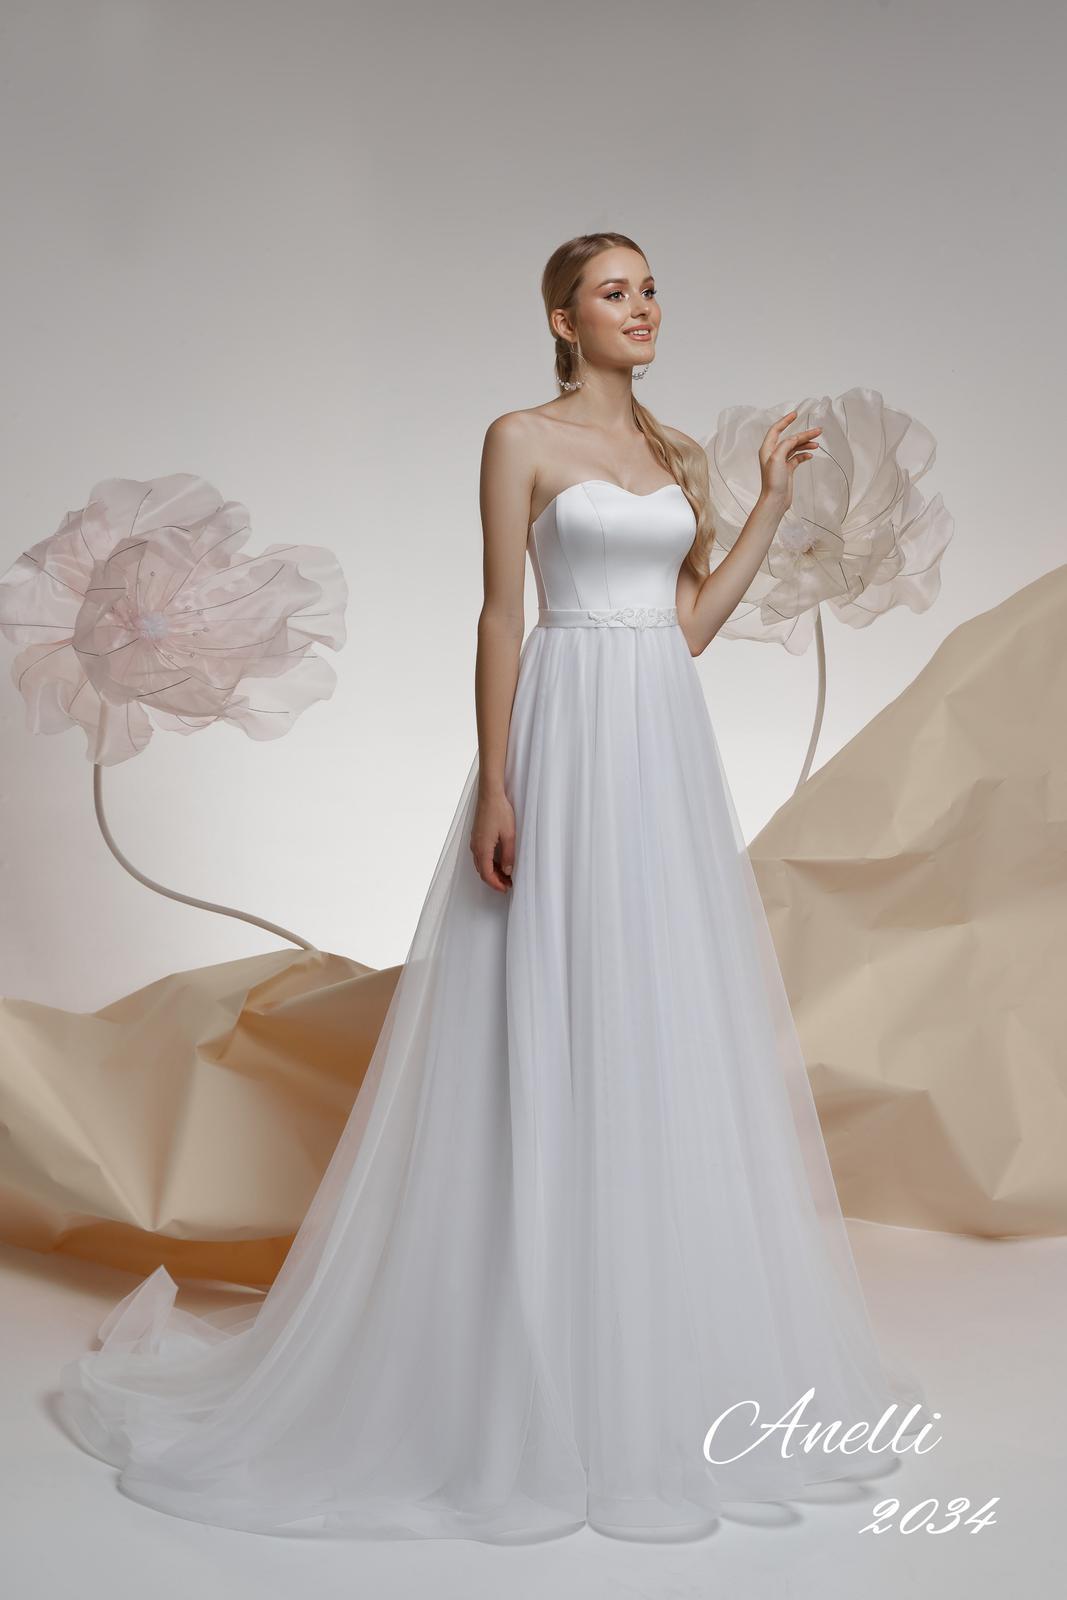 Svadobné šaty - Imagine 2034 - Obrázok č. 3